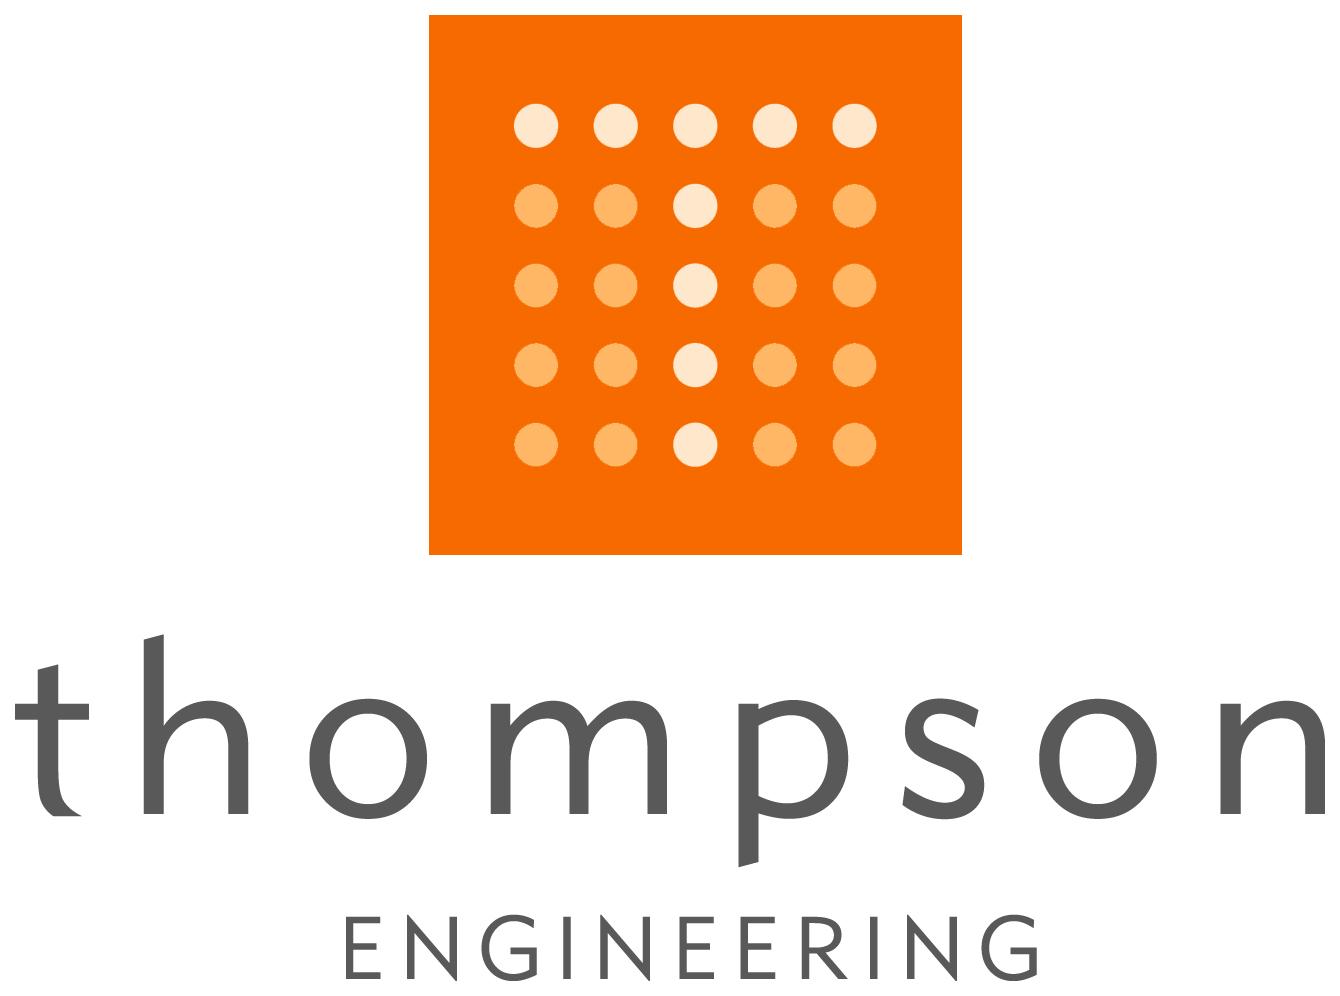 Thompson Engineering (http://thompsonengineering.com/)